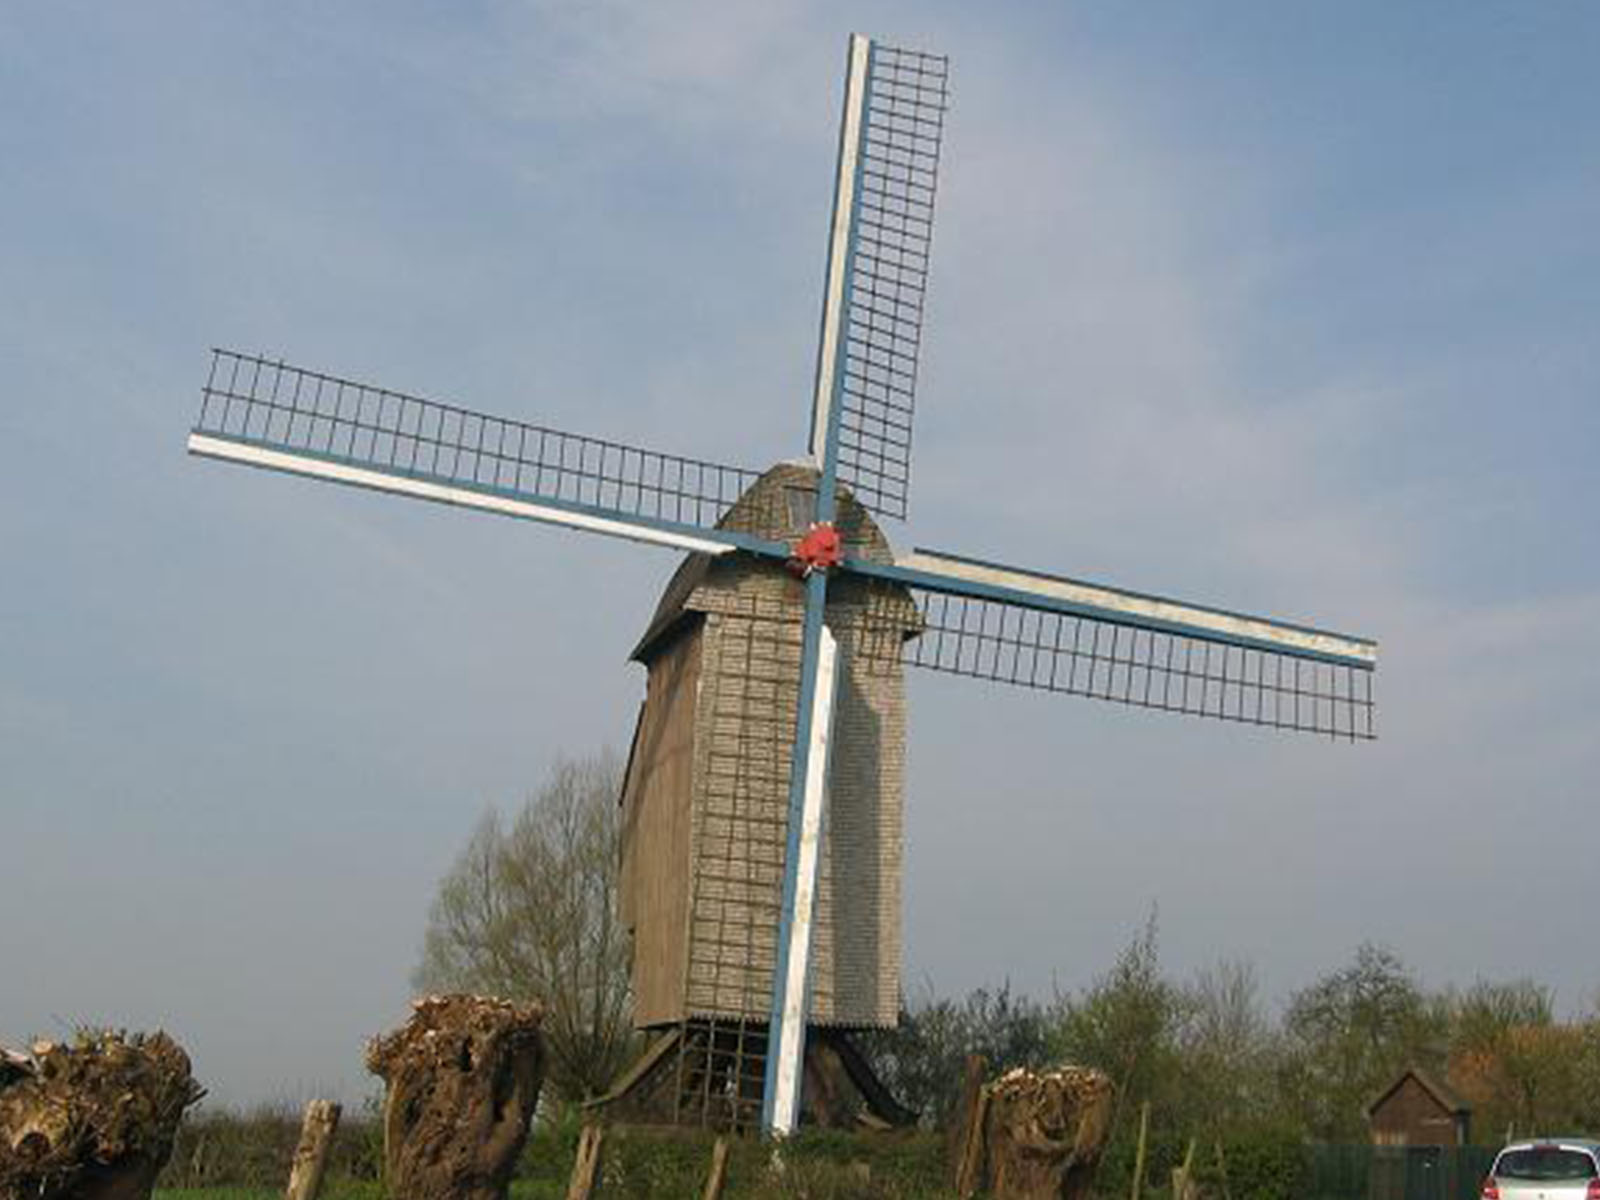 banniere-moulin-den-leeuw.jpg